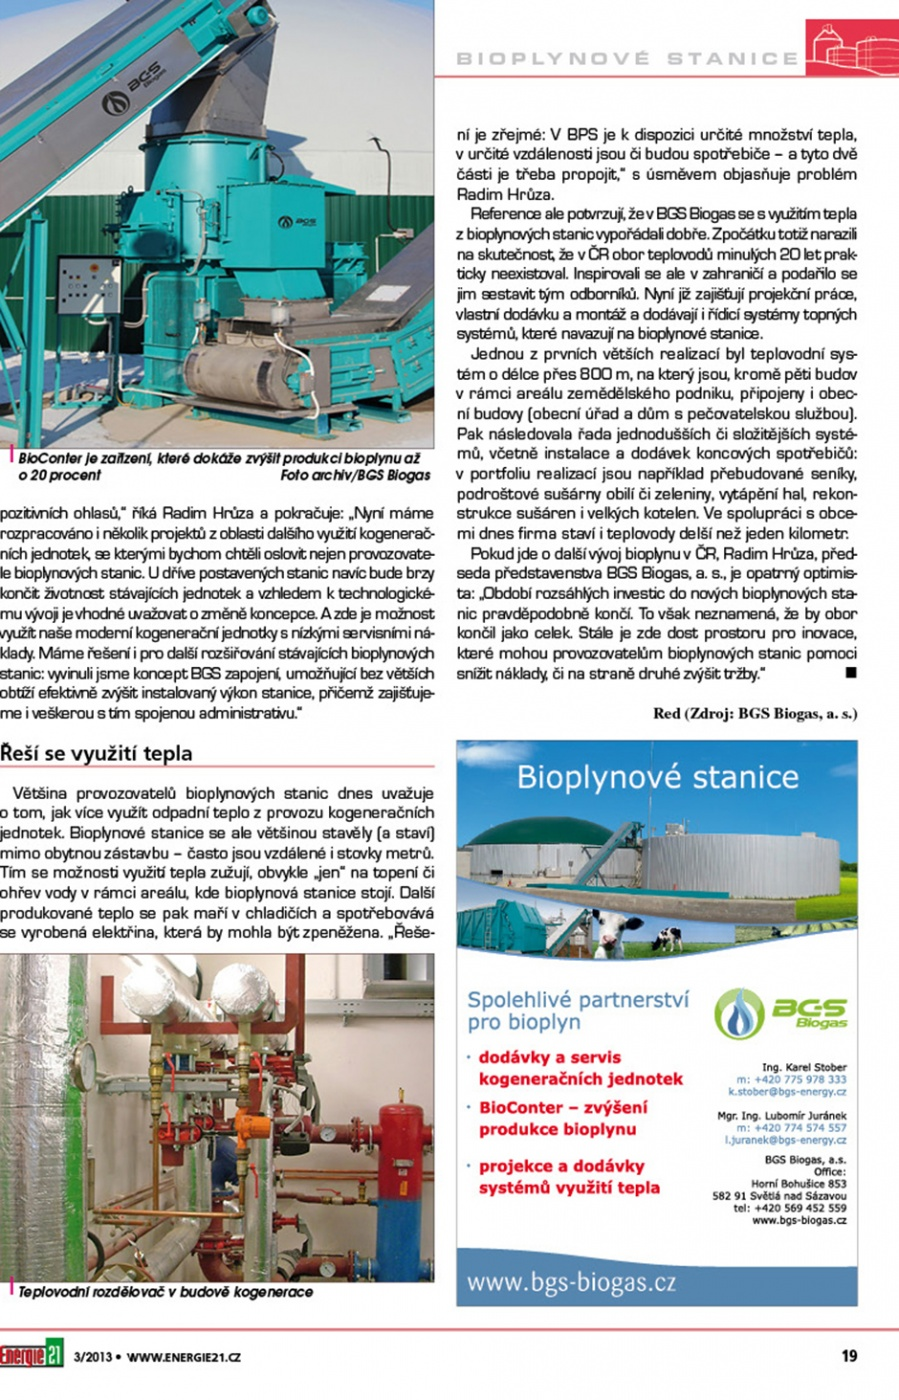 BGS-Biogas-Stale-je-dost-prostoru-pro-inovace-a-efektivitu_2